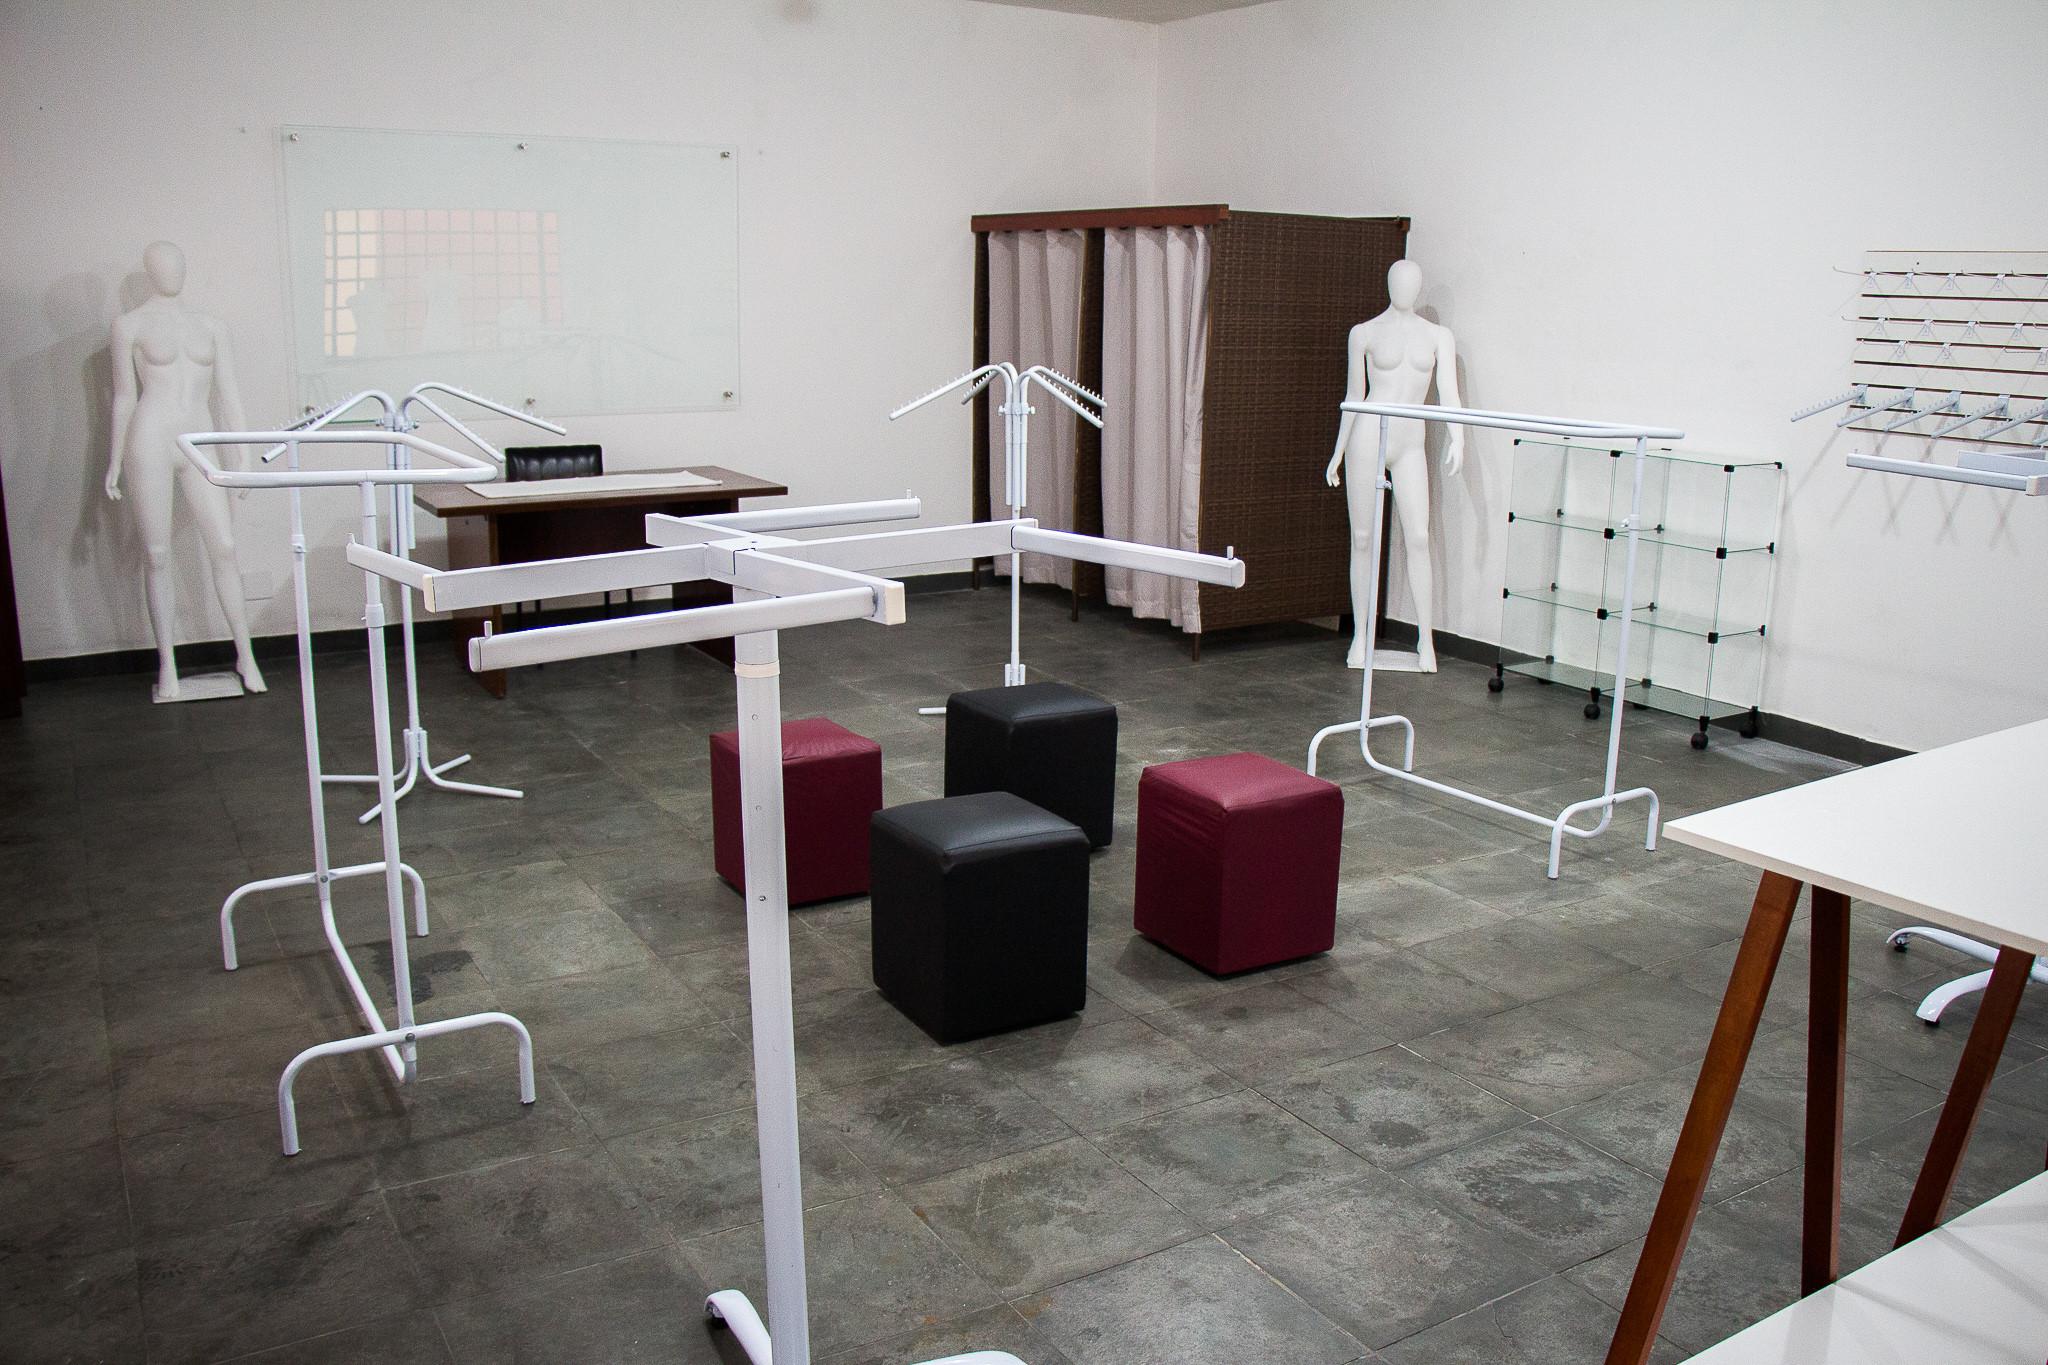 Sala 5 - Multiatividades